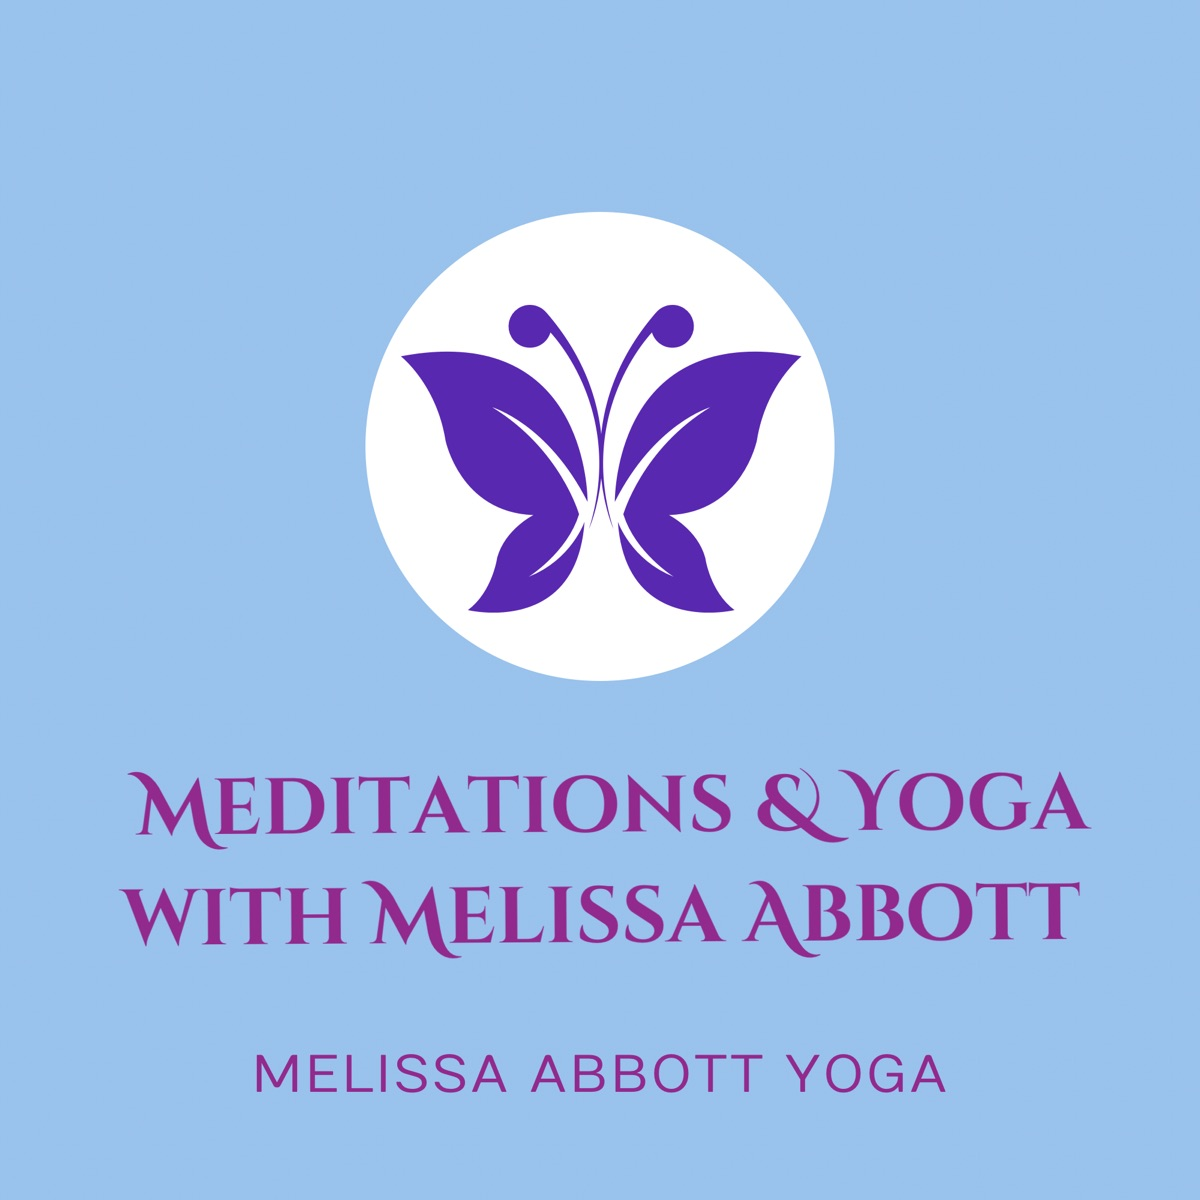 Meditation Yoga With Melissa Abbott Podcast Podtail